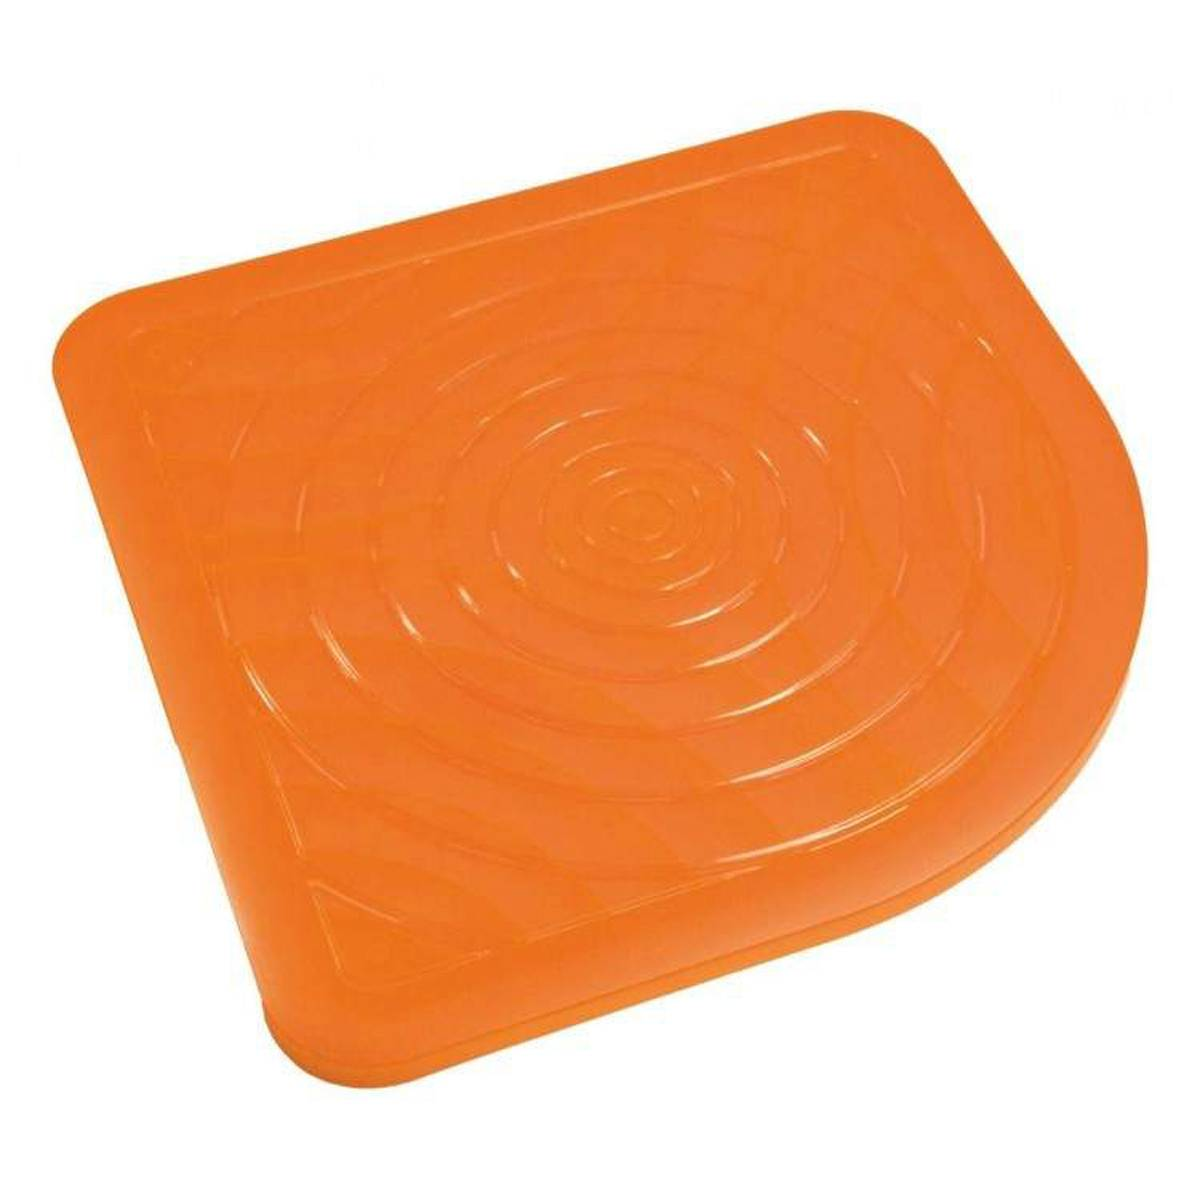 Pedana doccia Oasi arancio antiscivolo design made in italy